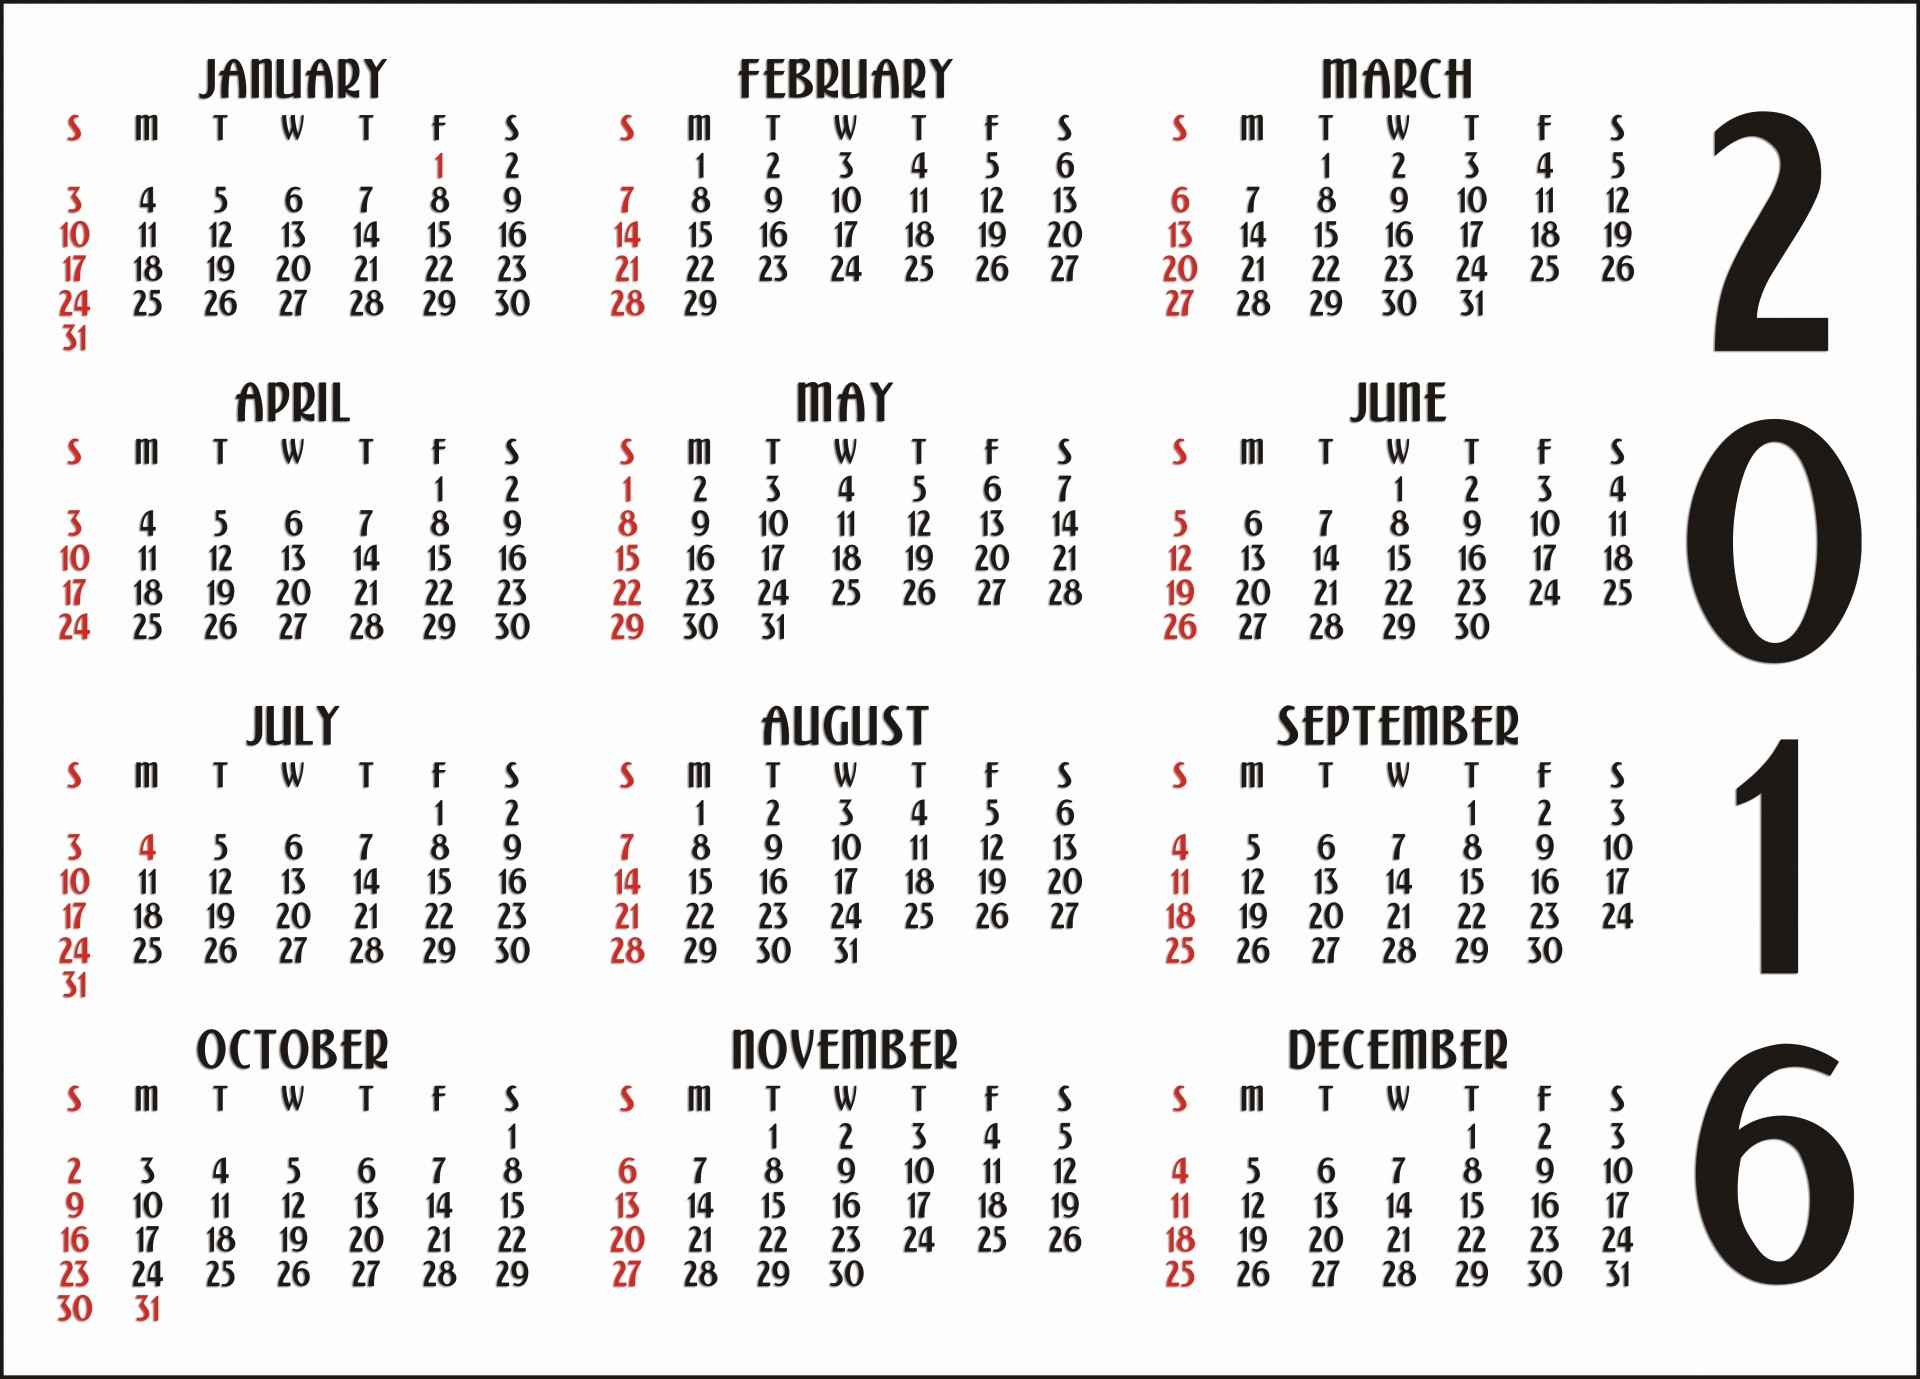 12 Month Calendar for 2016 Luxury 12 Month Calendar 2016 Free Stock Public Domain